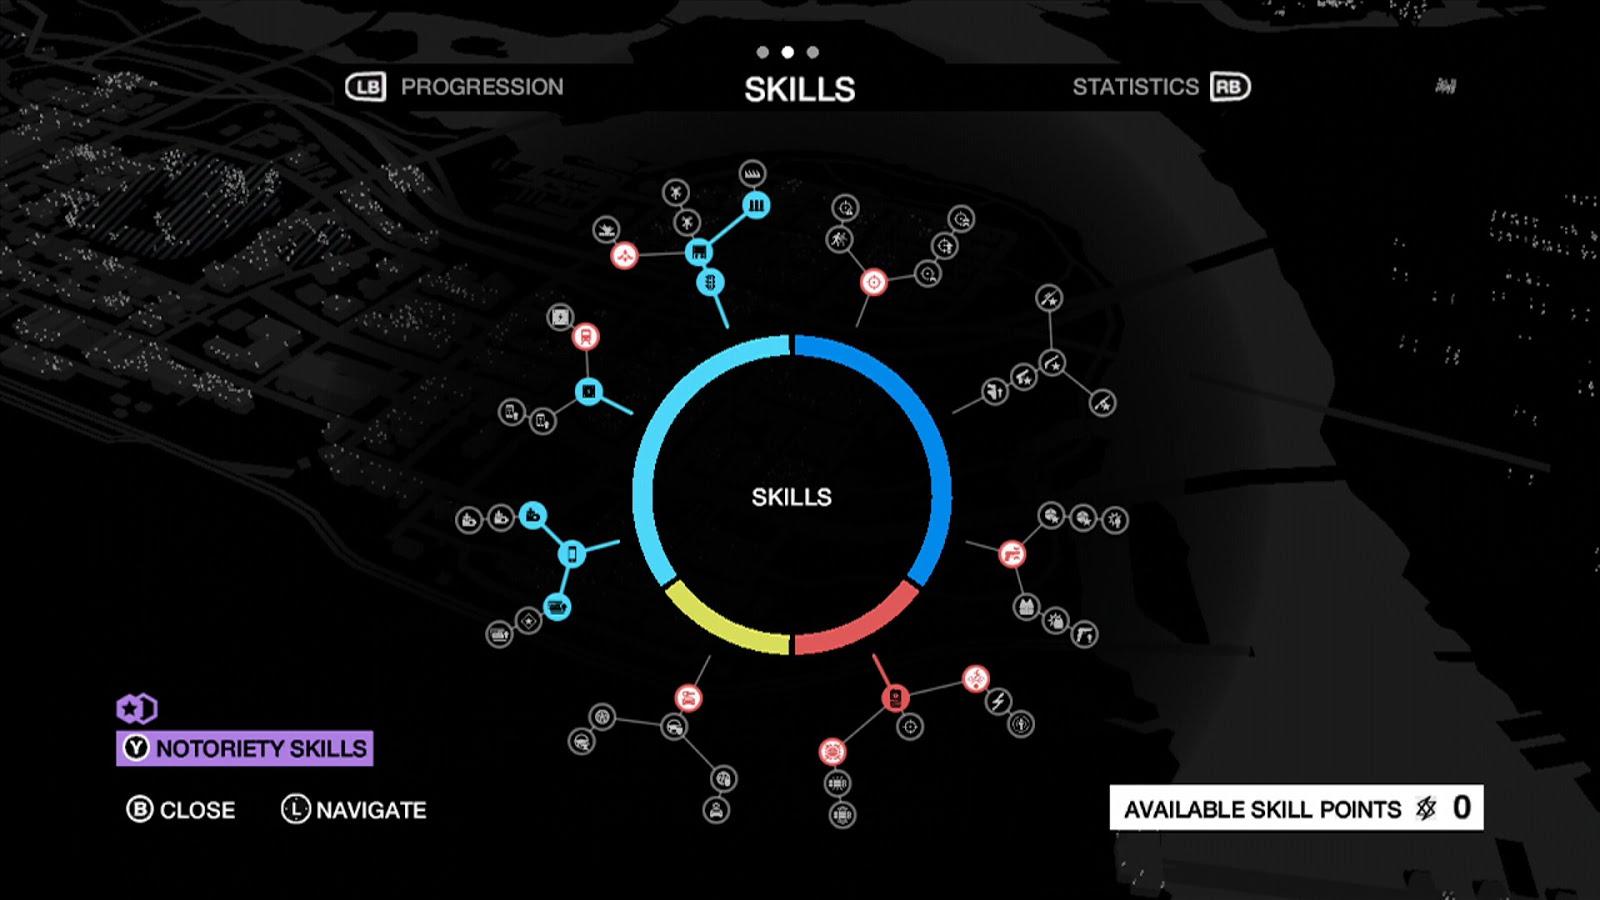 Watch-Dogs-Skill-Tree-Guide.jpg